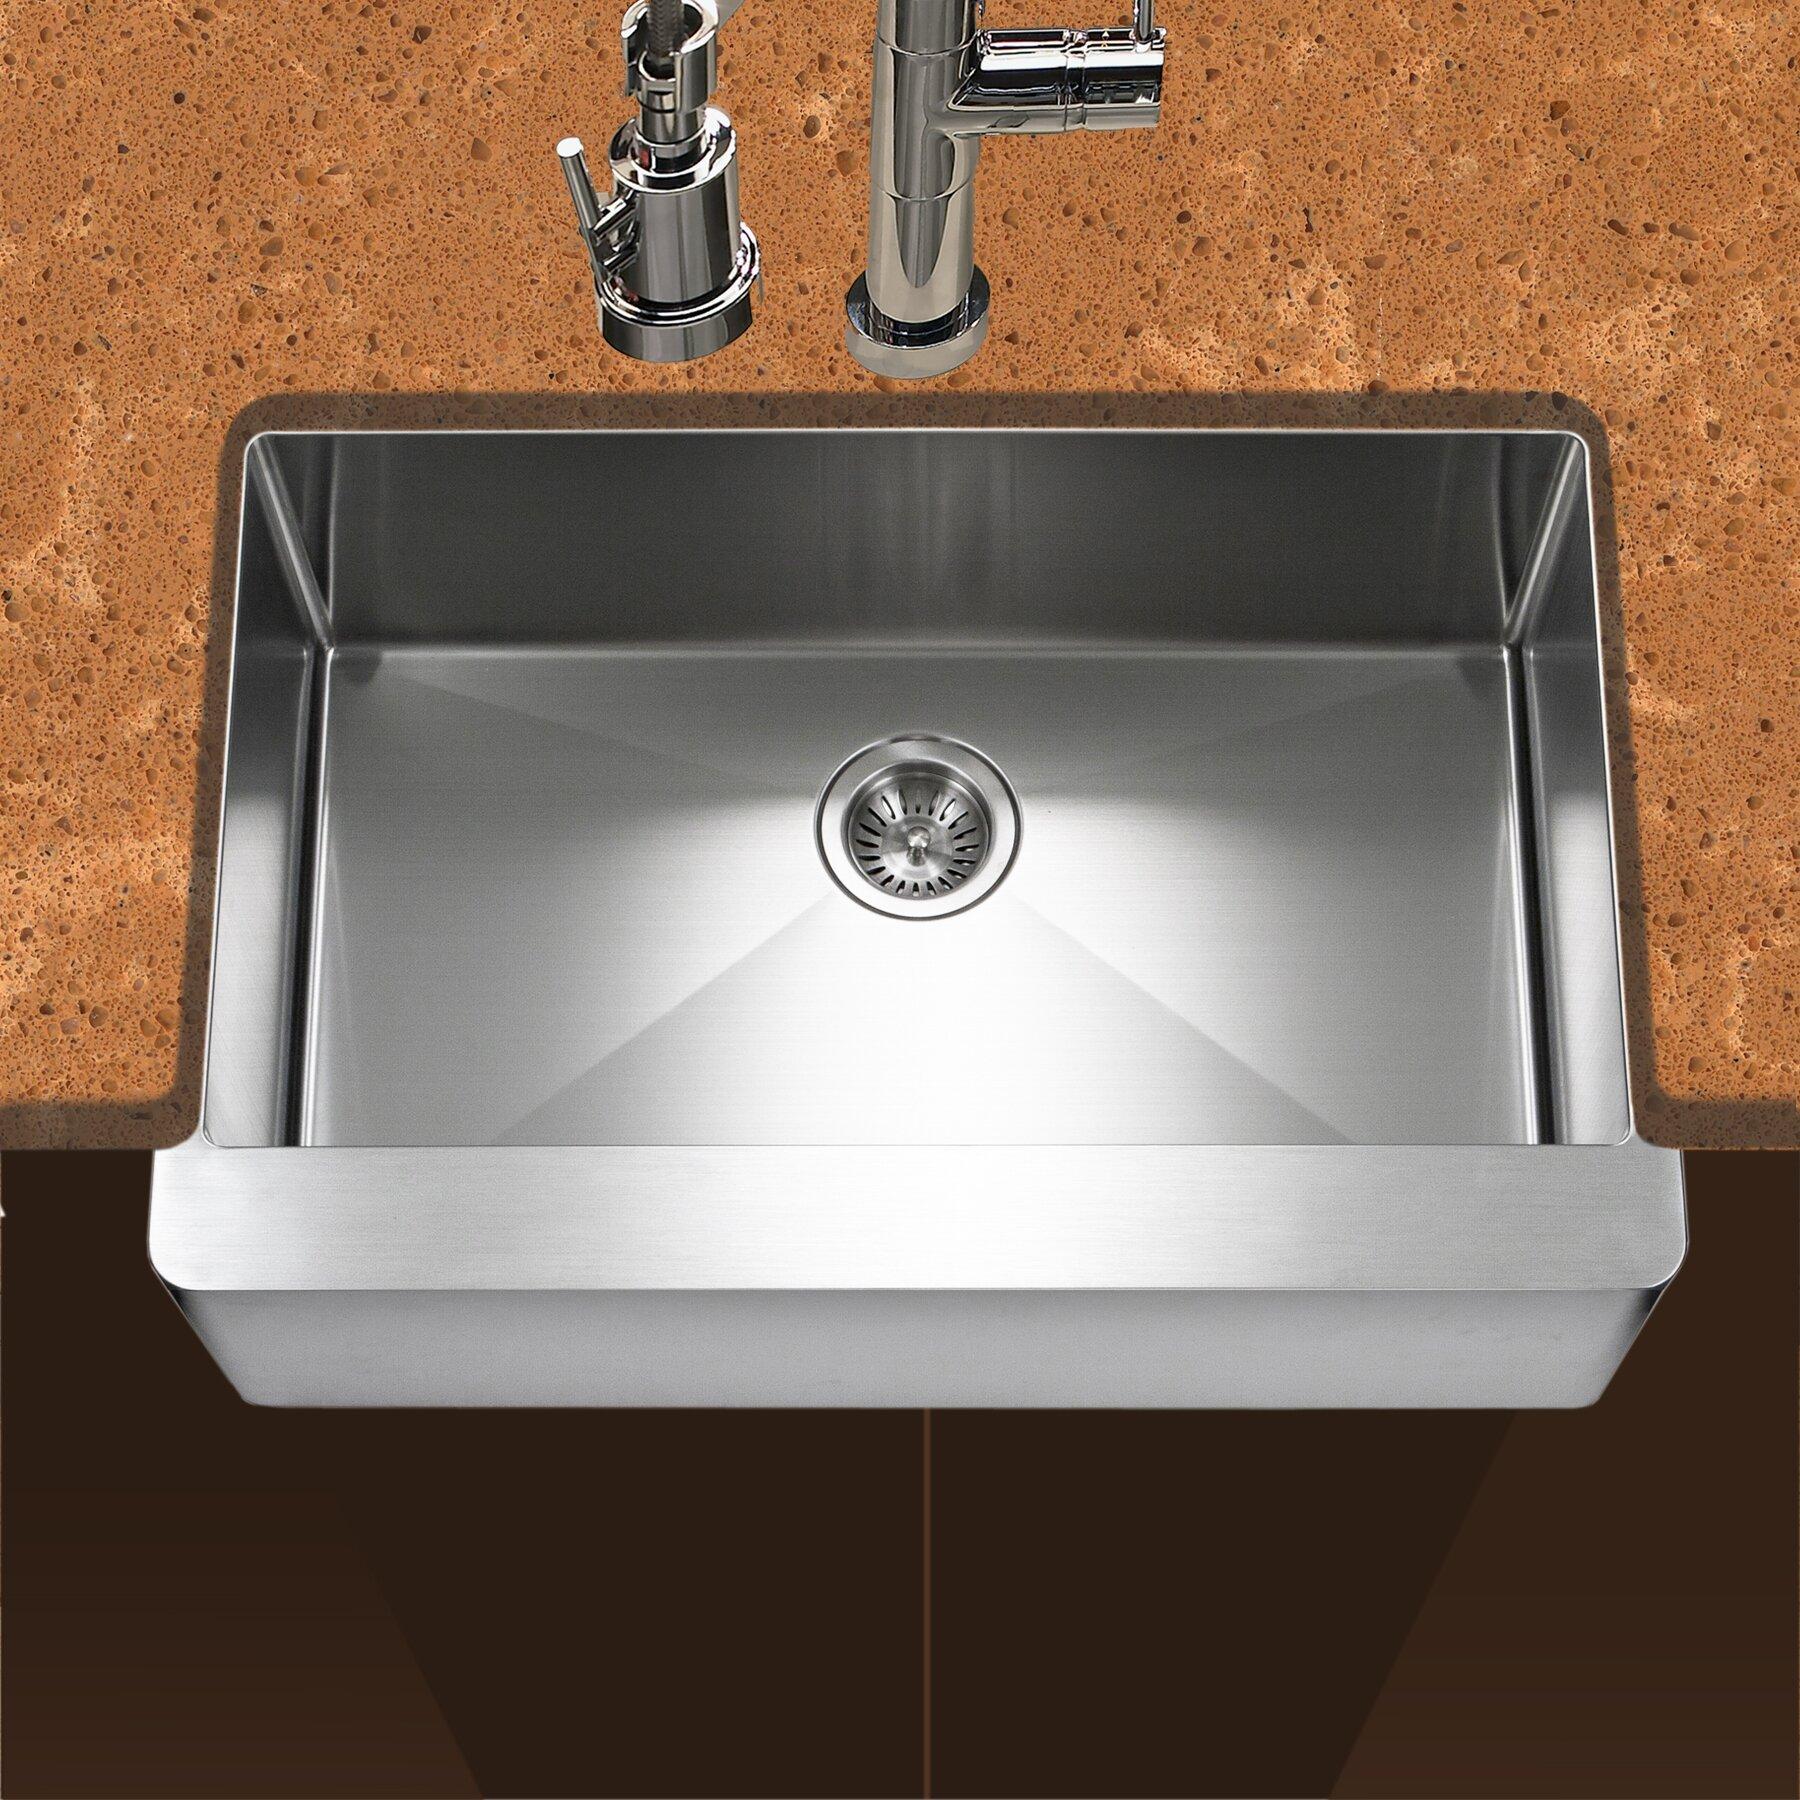 "Apron Kitchen Sinks: Houzer Epicure 30"" X 20"" Series Single Bowl Apron Front"